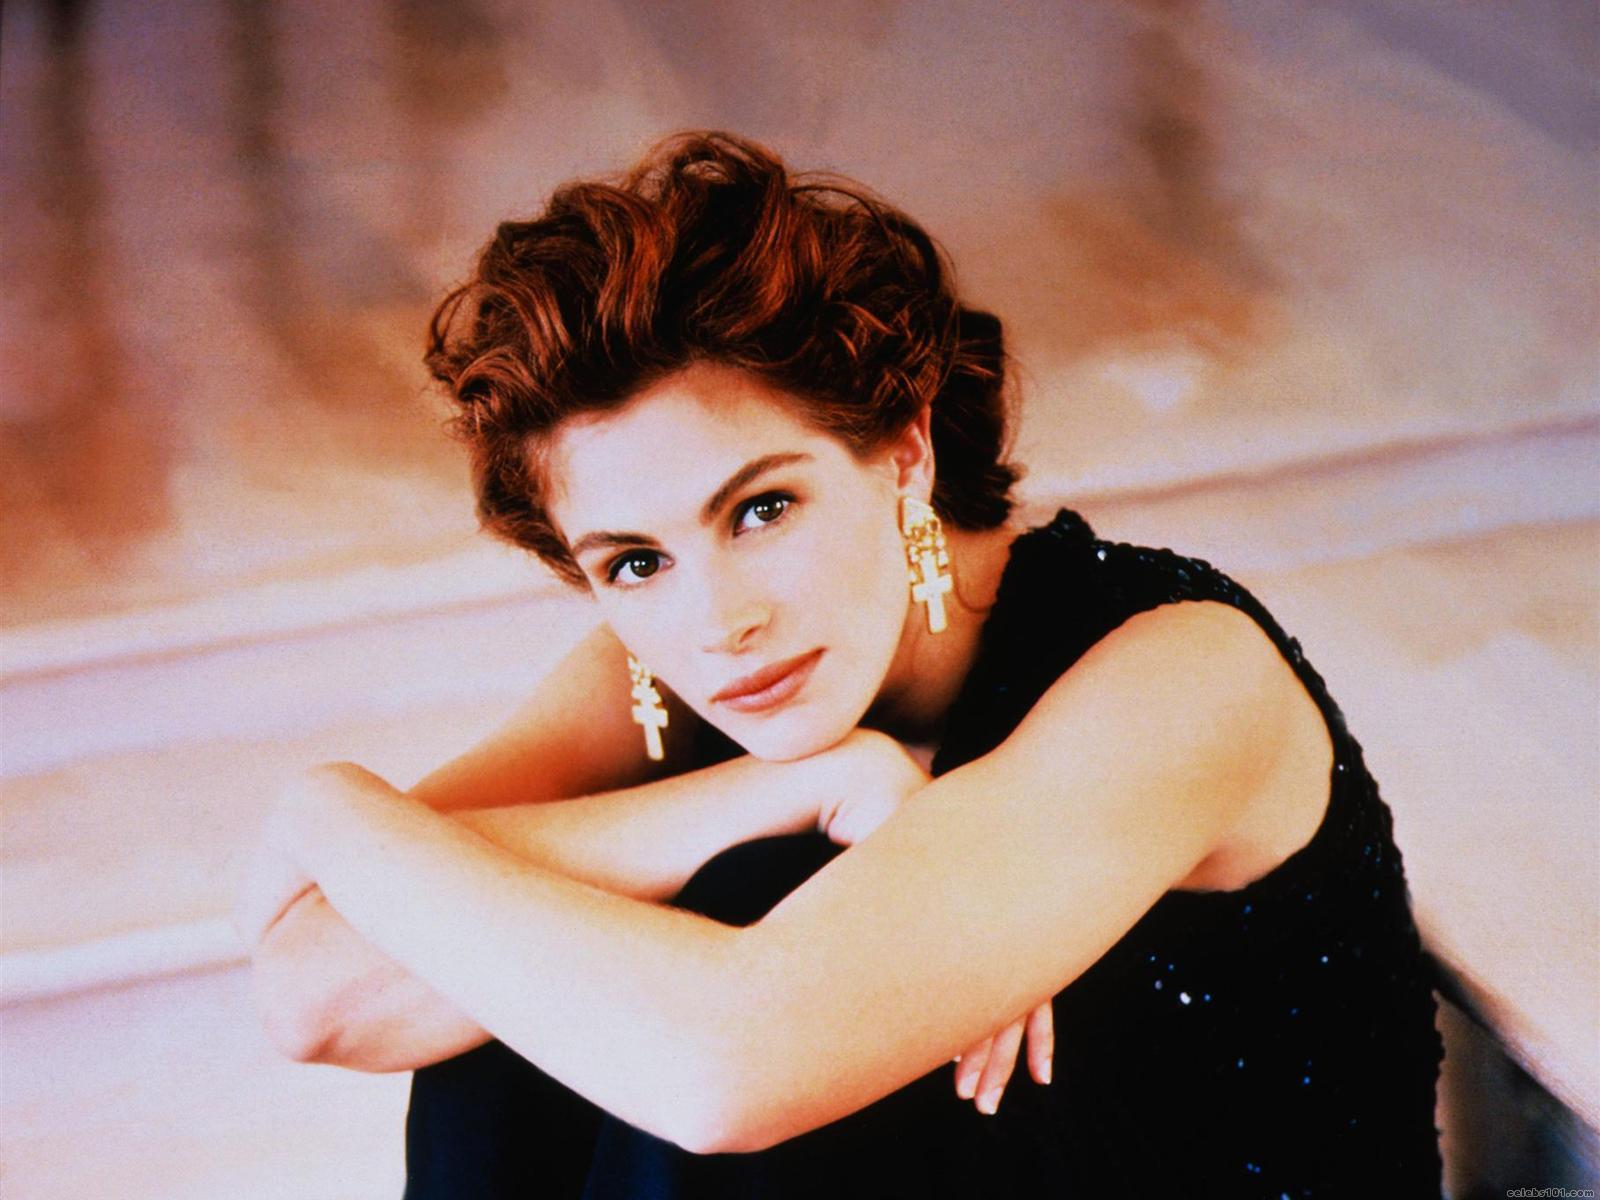 http://4.bp.blogspot.com/-v2hbKUAmYk0/UM5BdfdGawI/AAAAAAAAnaA/PzVG3CRs4yo/s1600/Julia-Roberts-earrings.jpg